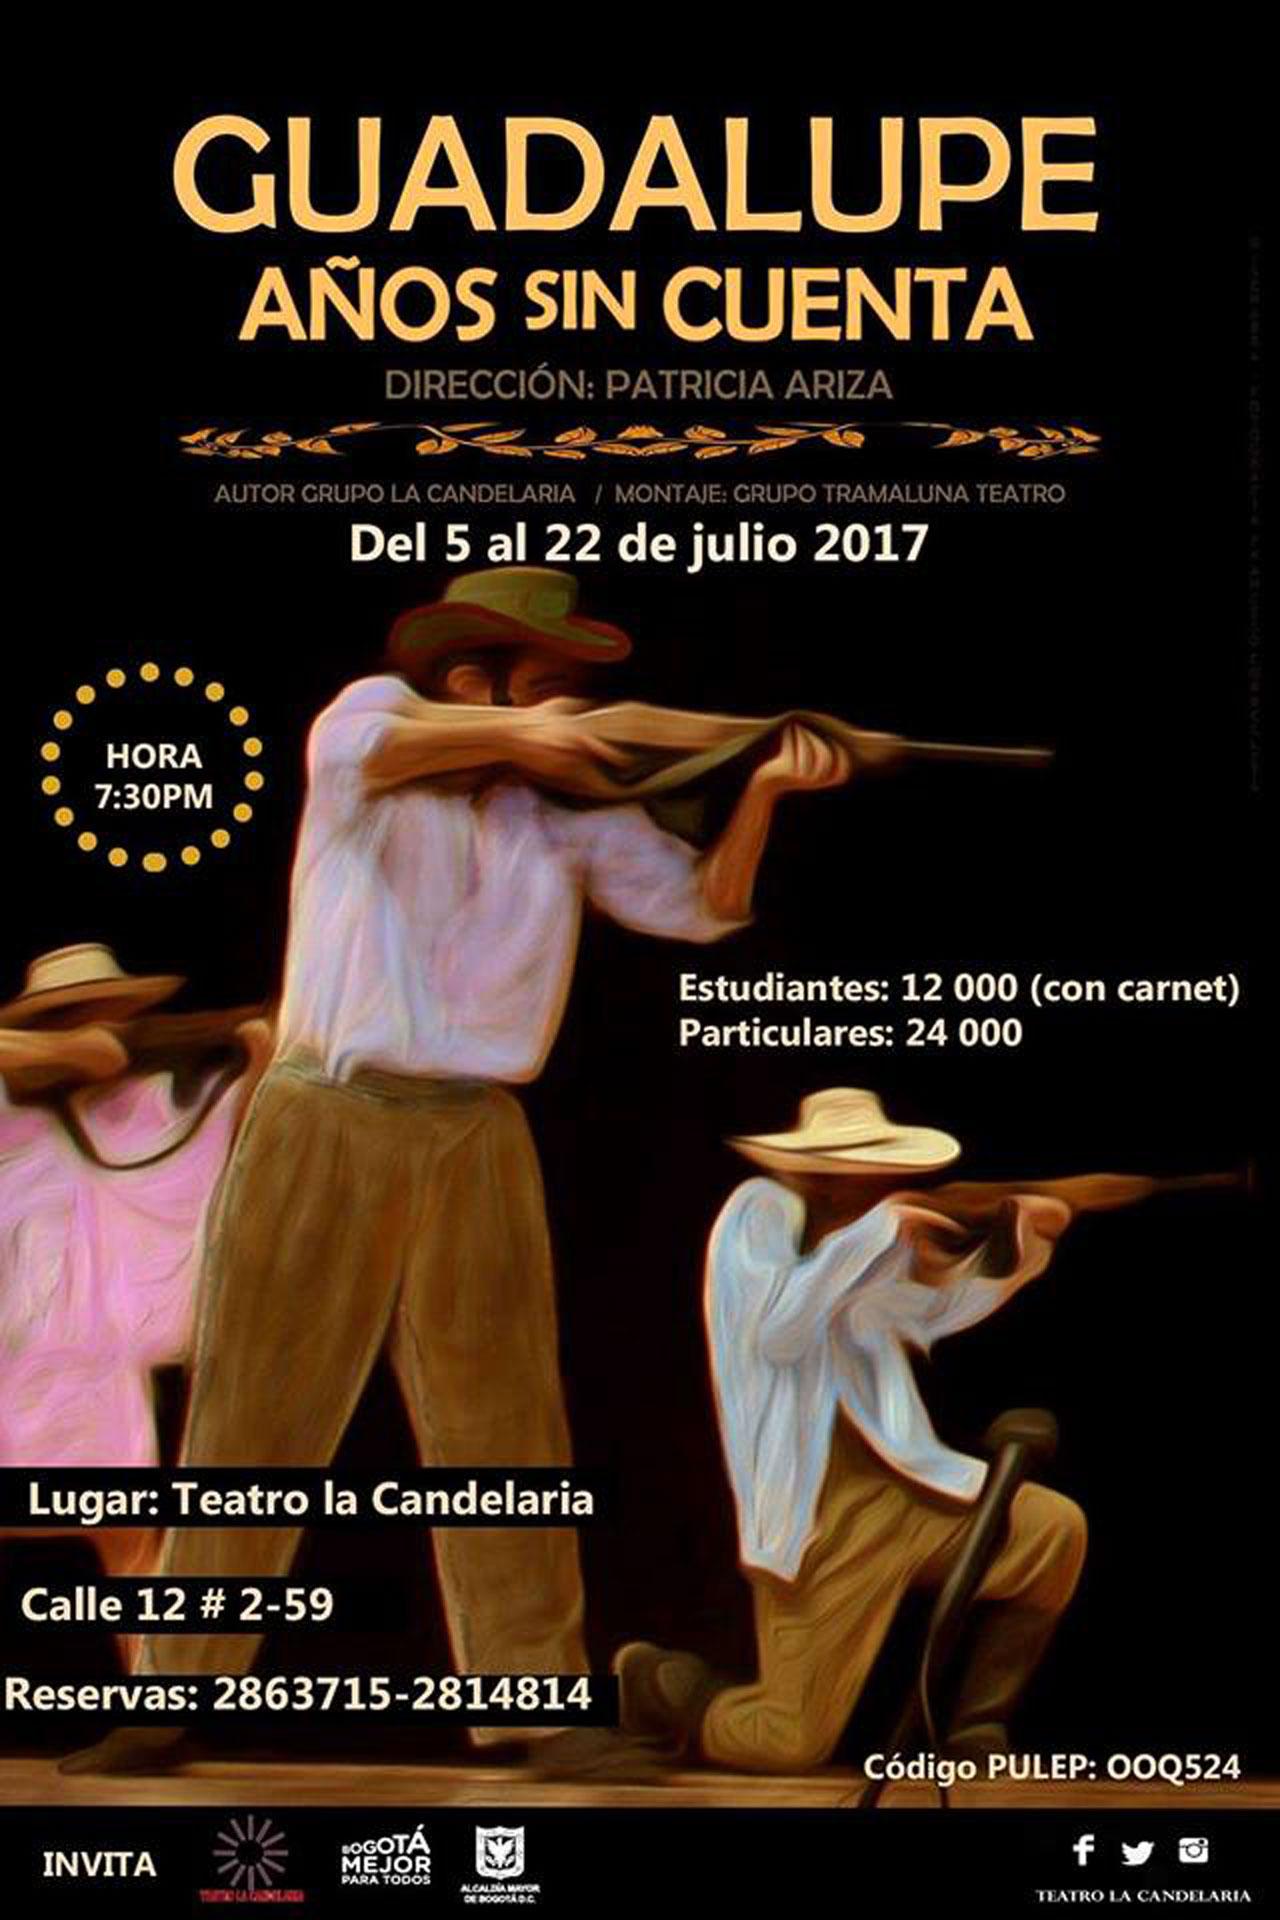 guadalupe-flyer.jpg